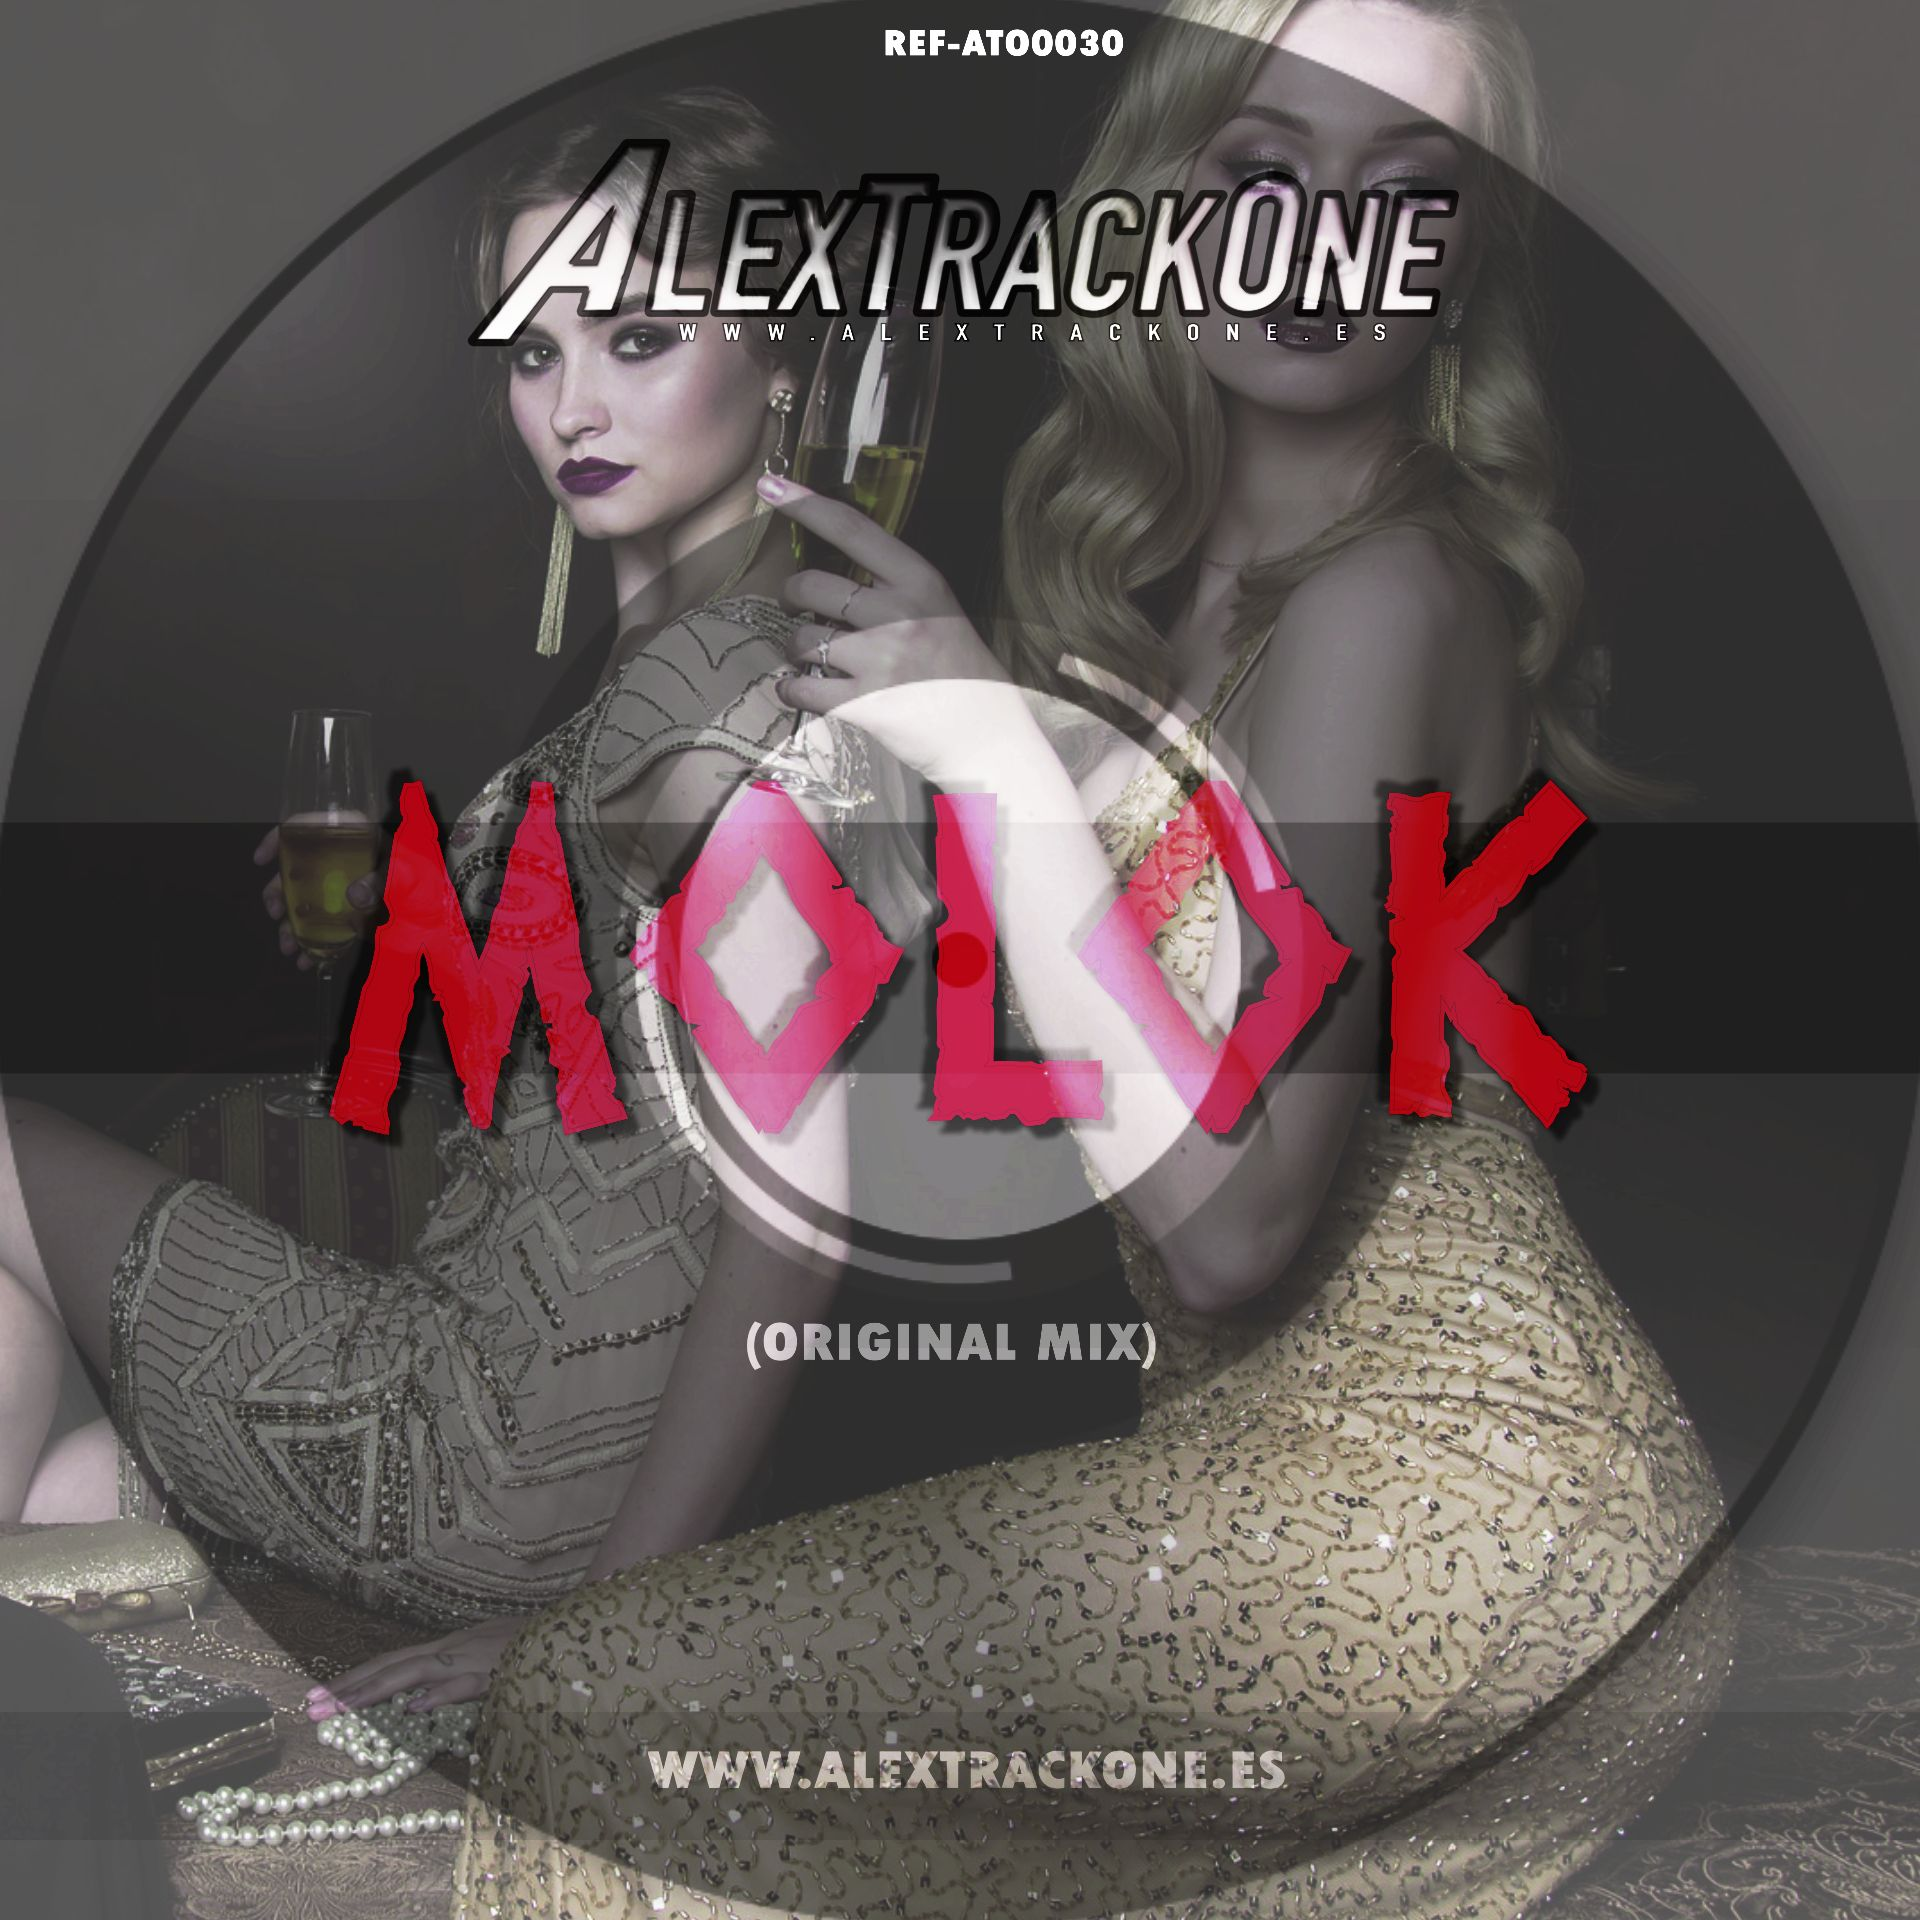 REF-ATO0030 MOLOK (ORIGINAL MIX) (MP3 & WAV)